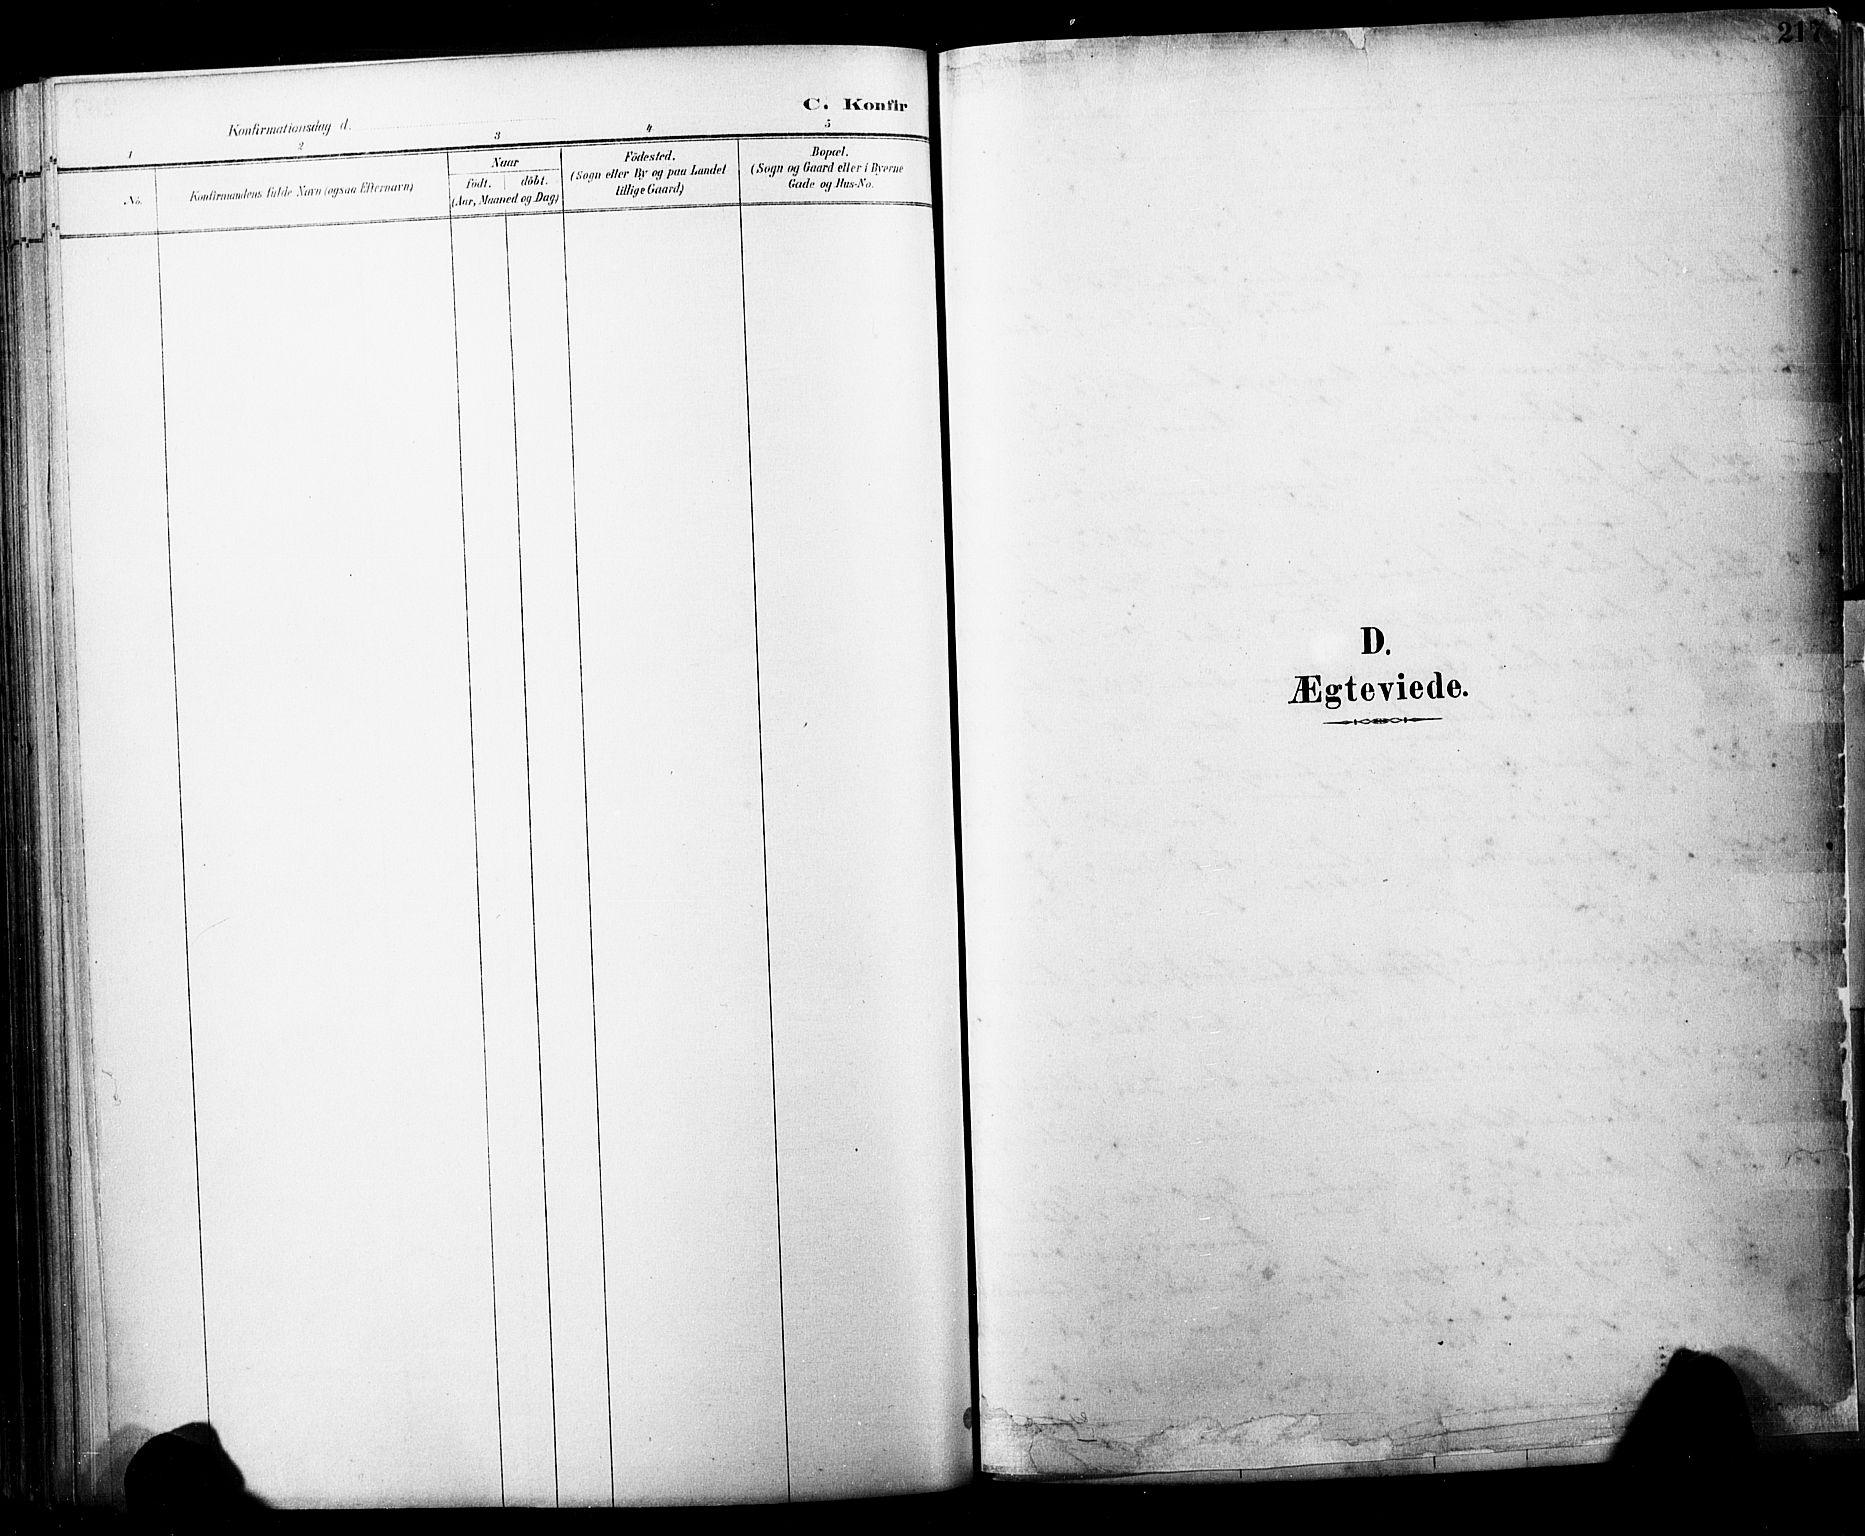 SAKO, Horten kirkebøker, F/Fa/L0004: Parish register (official) no. 4, 1888-1895, p. 217